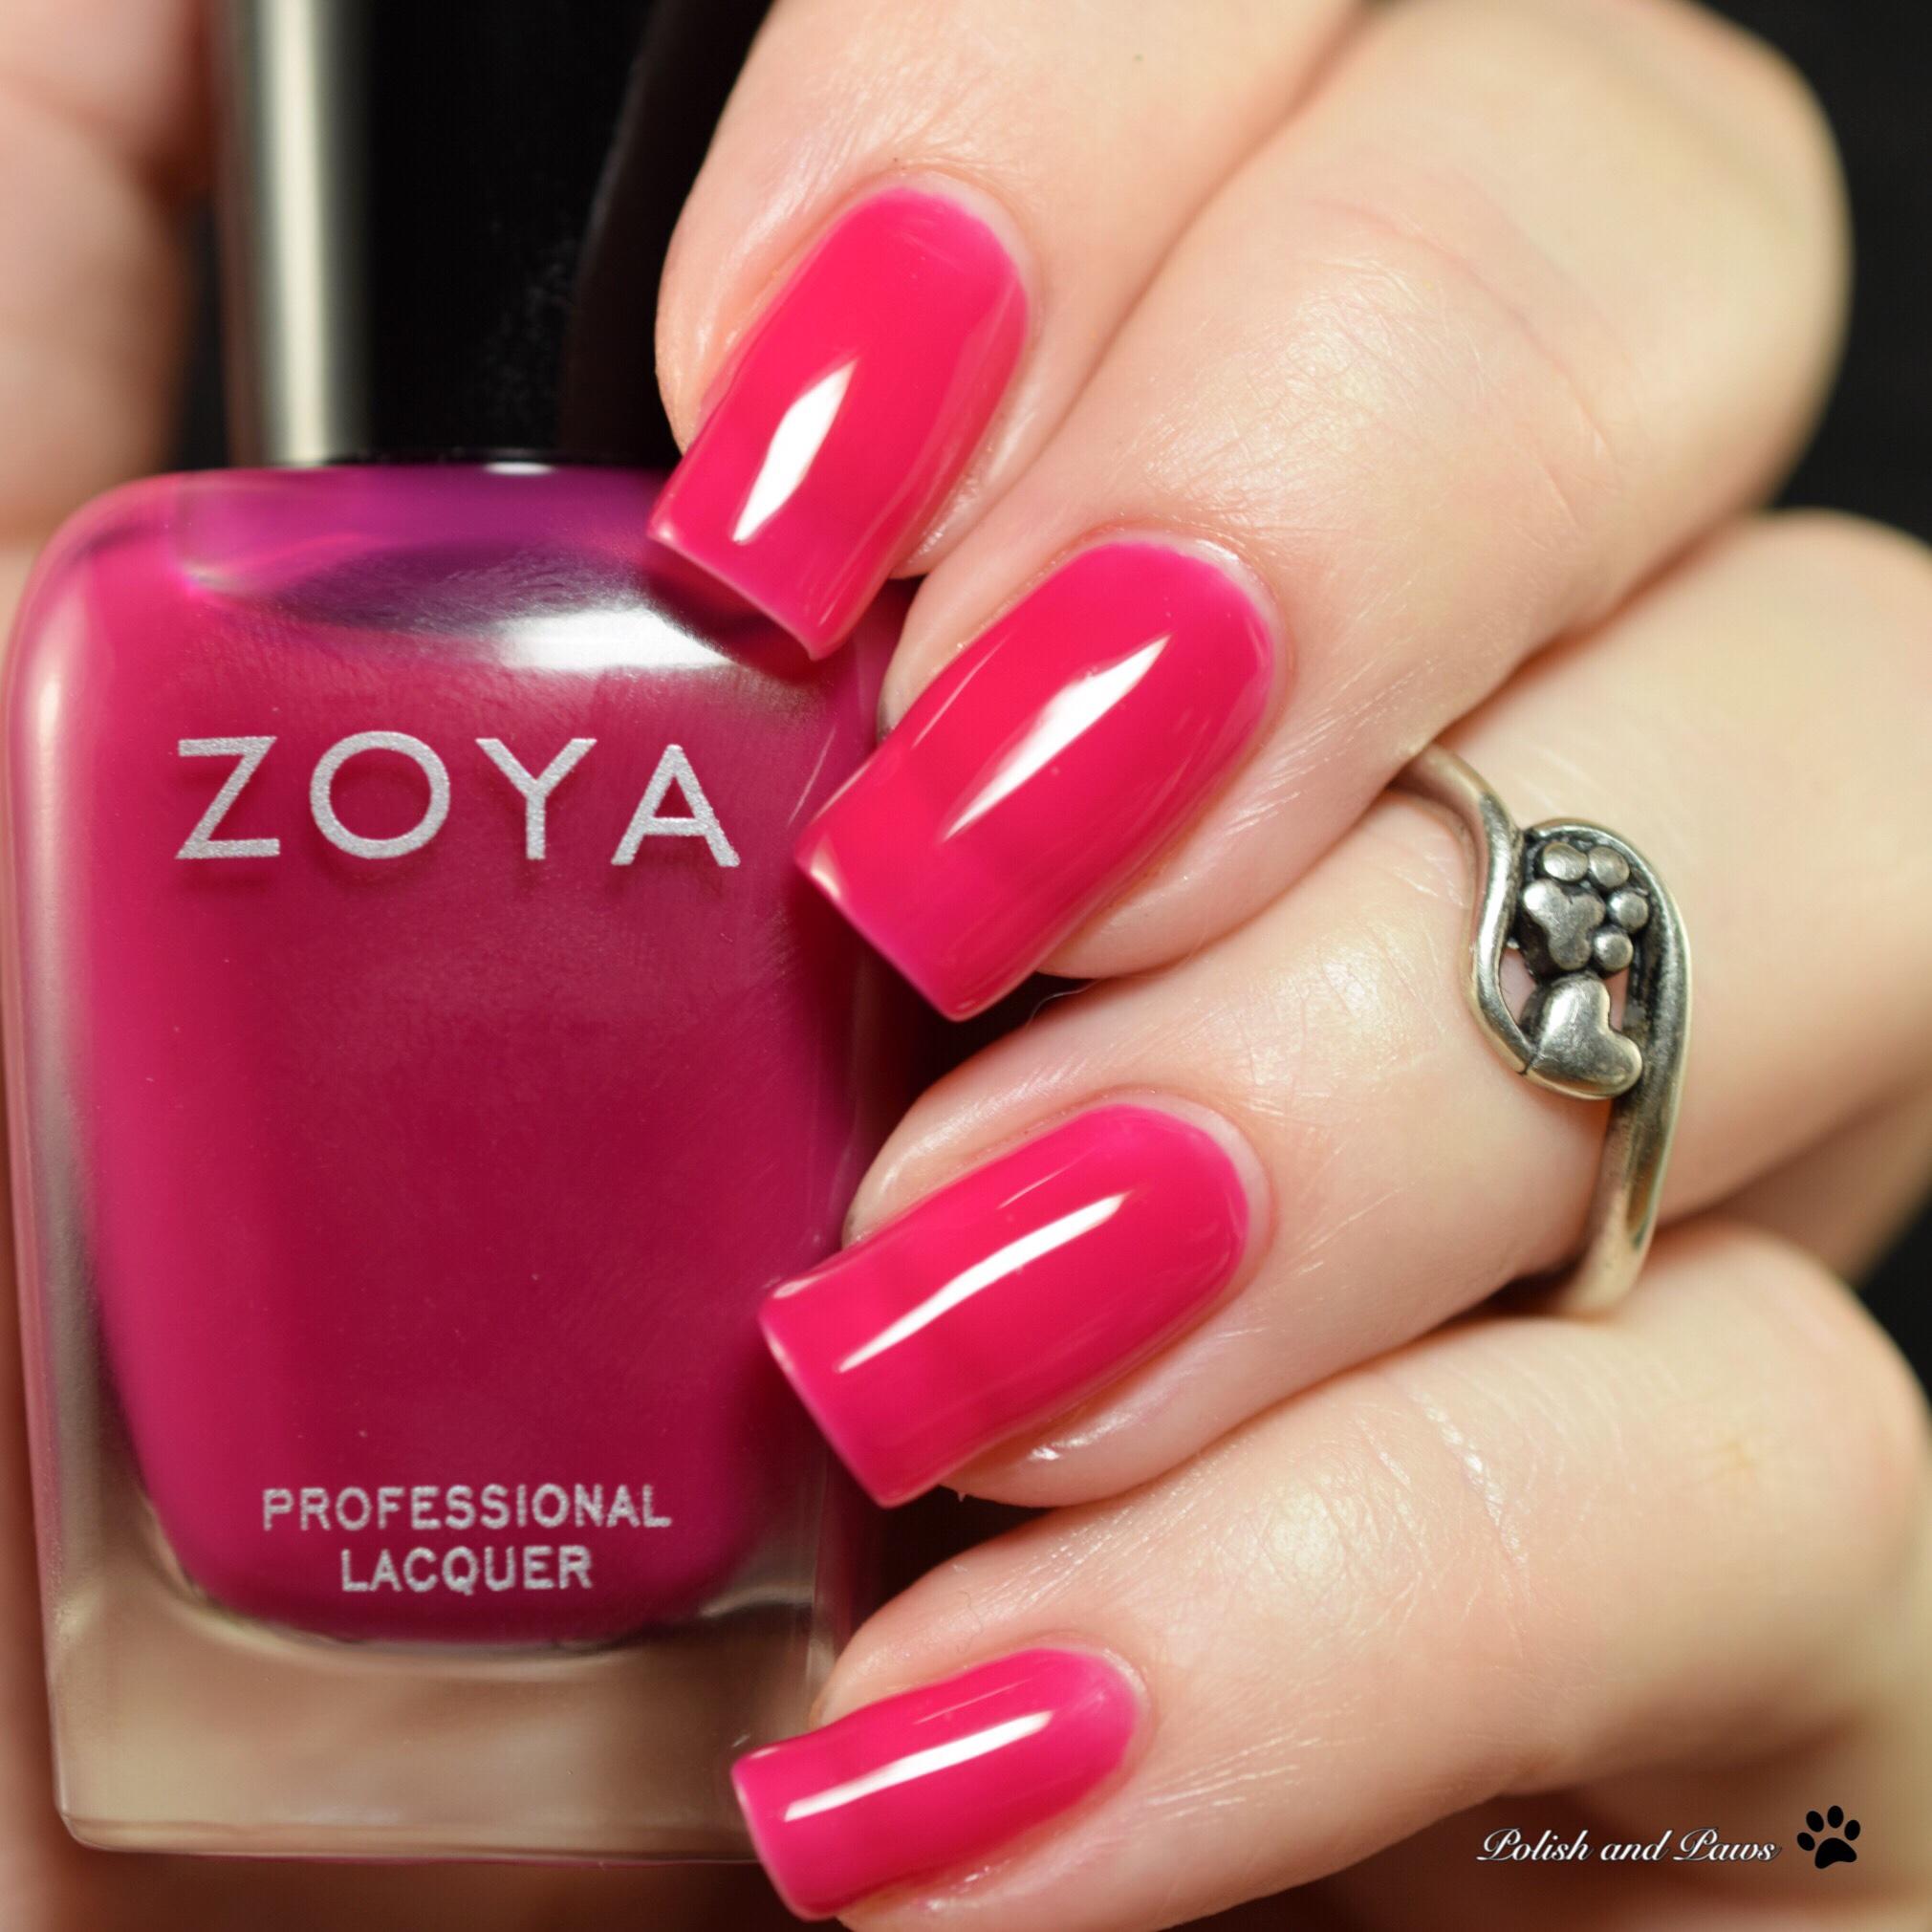 Zoya Paris